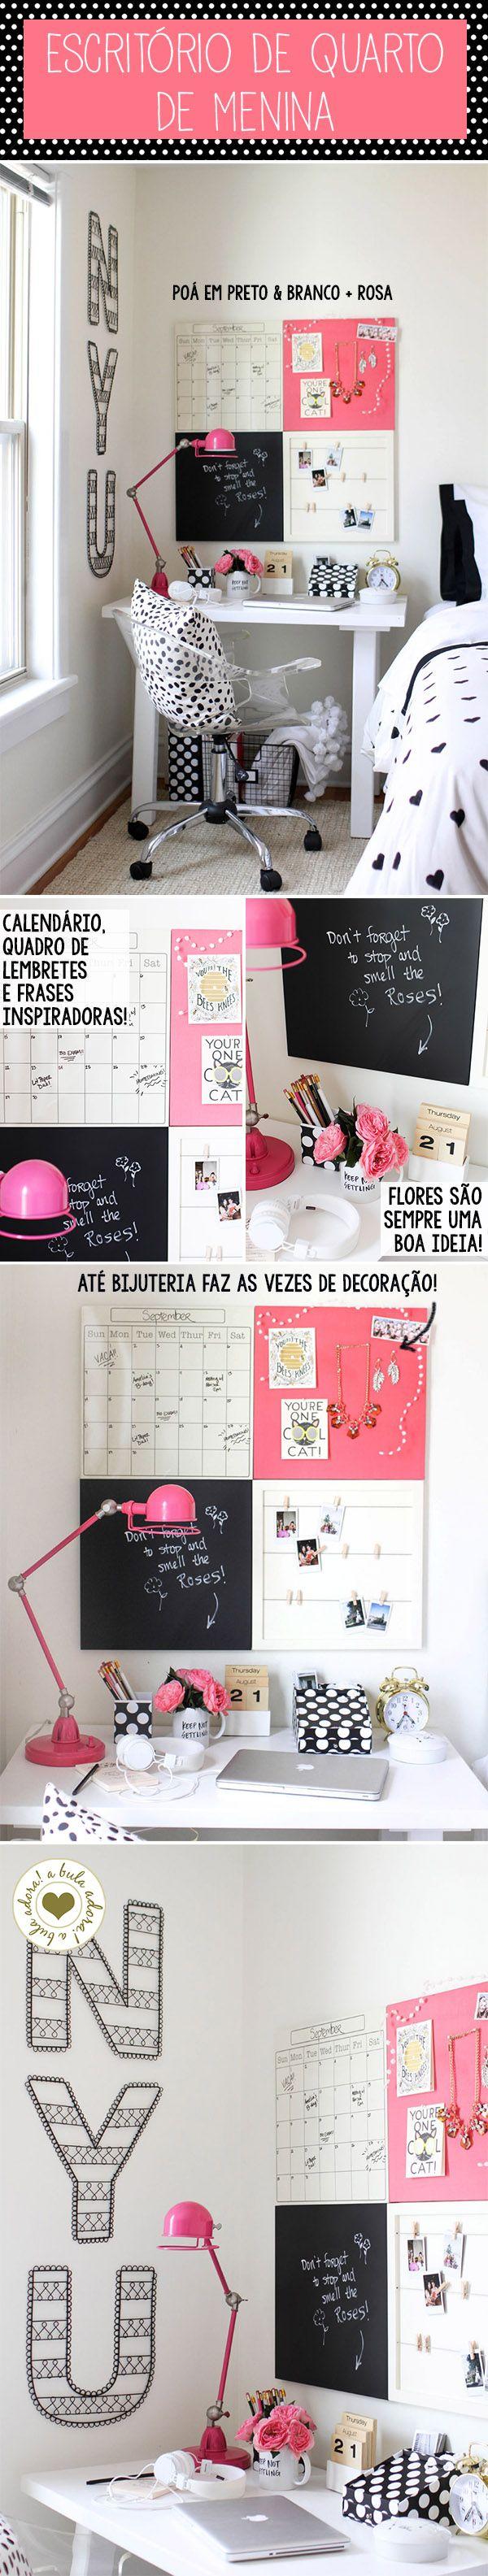 Pink + Poá preto e branco (From http://buladaarquitetura.tnh1.com.br/)